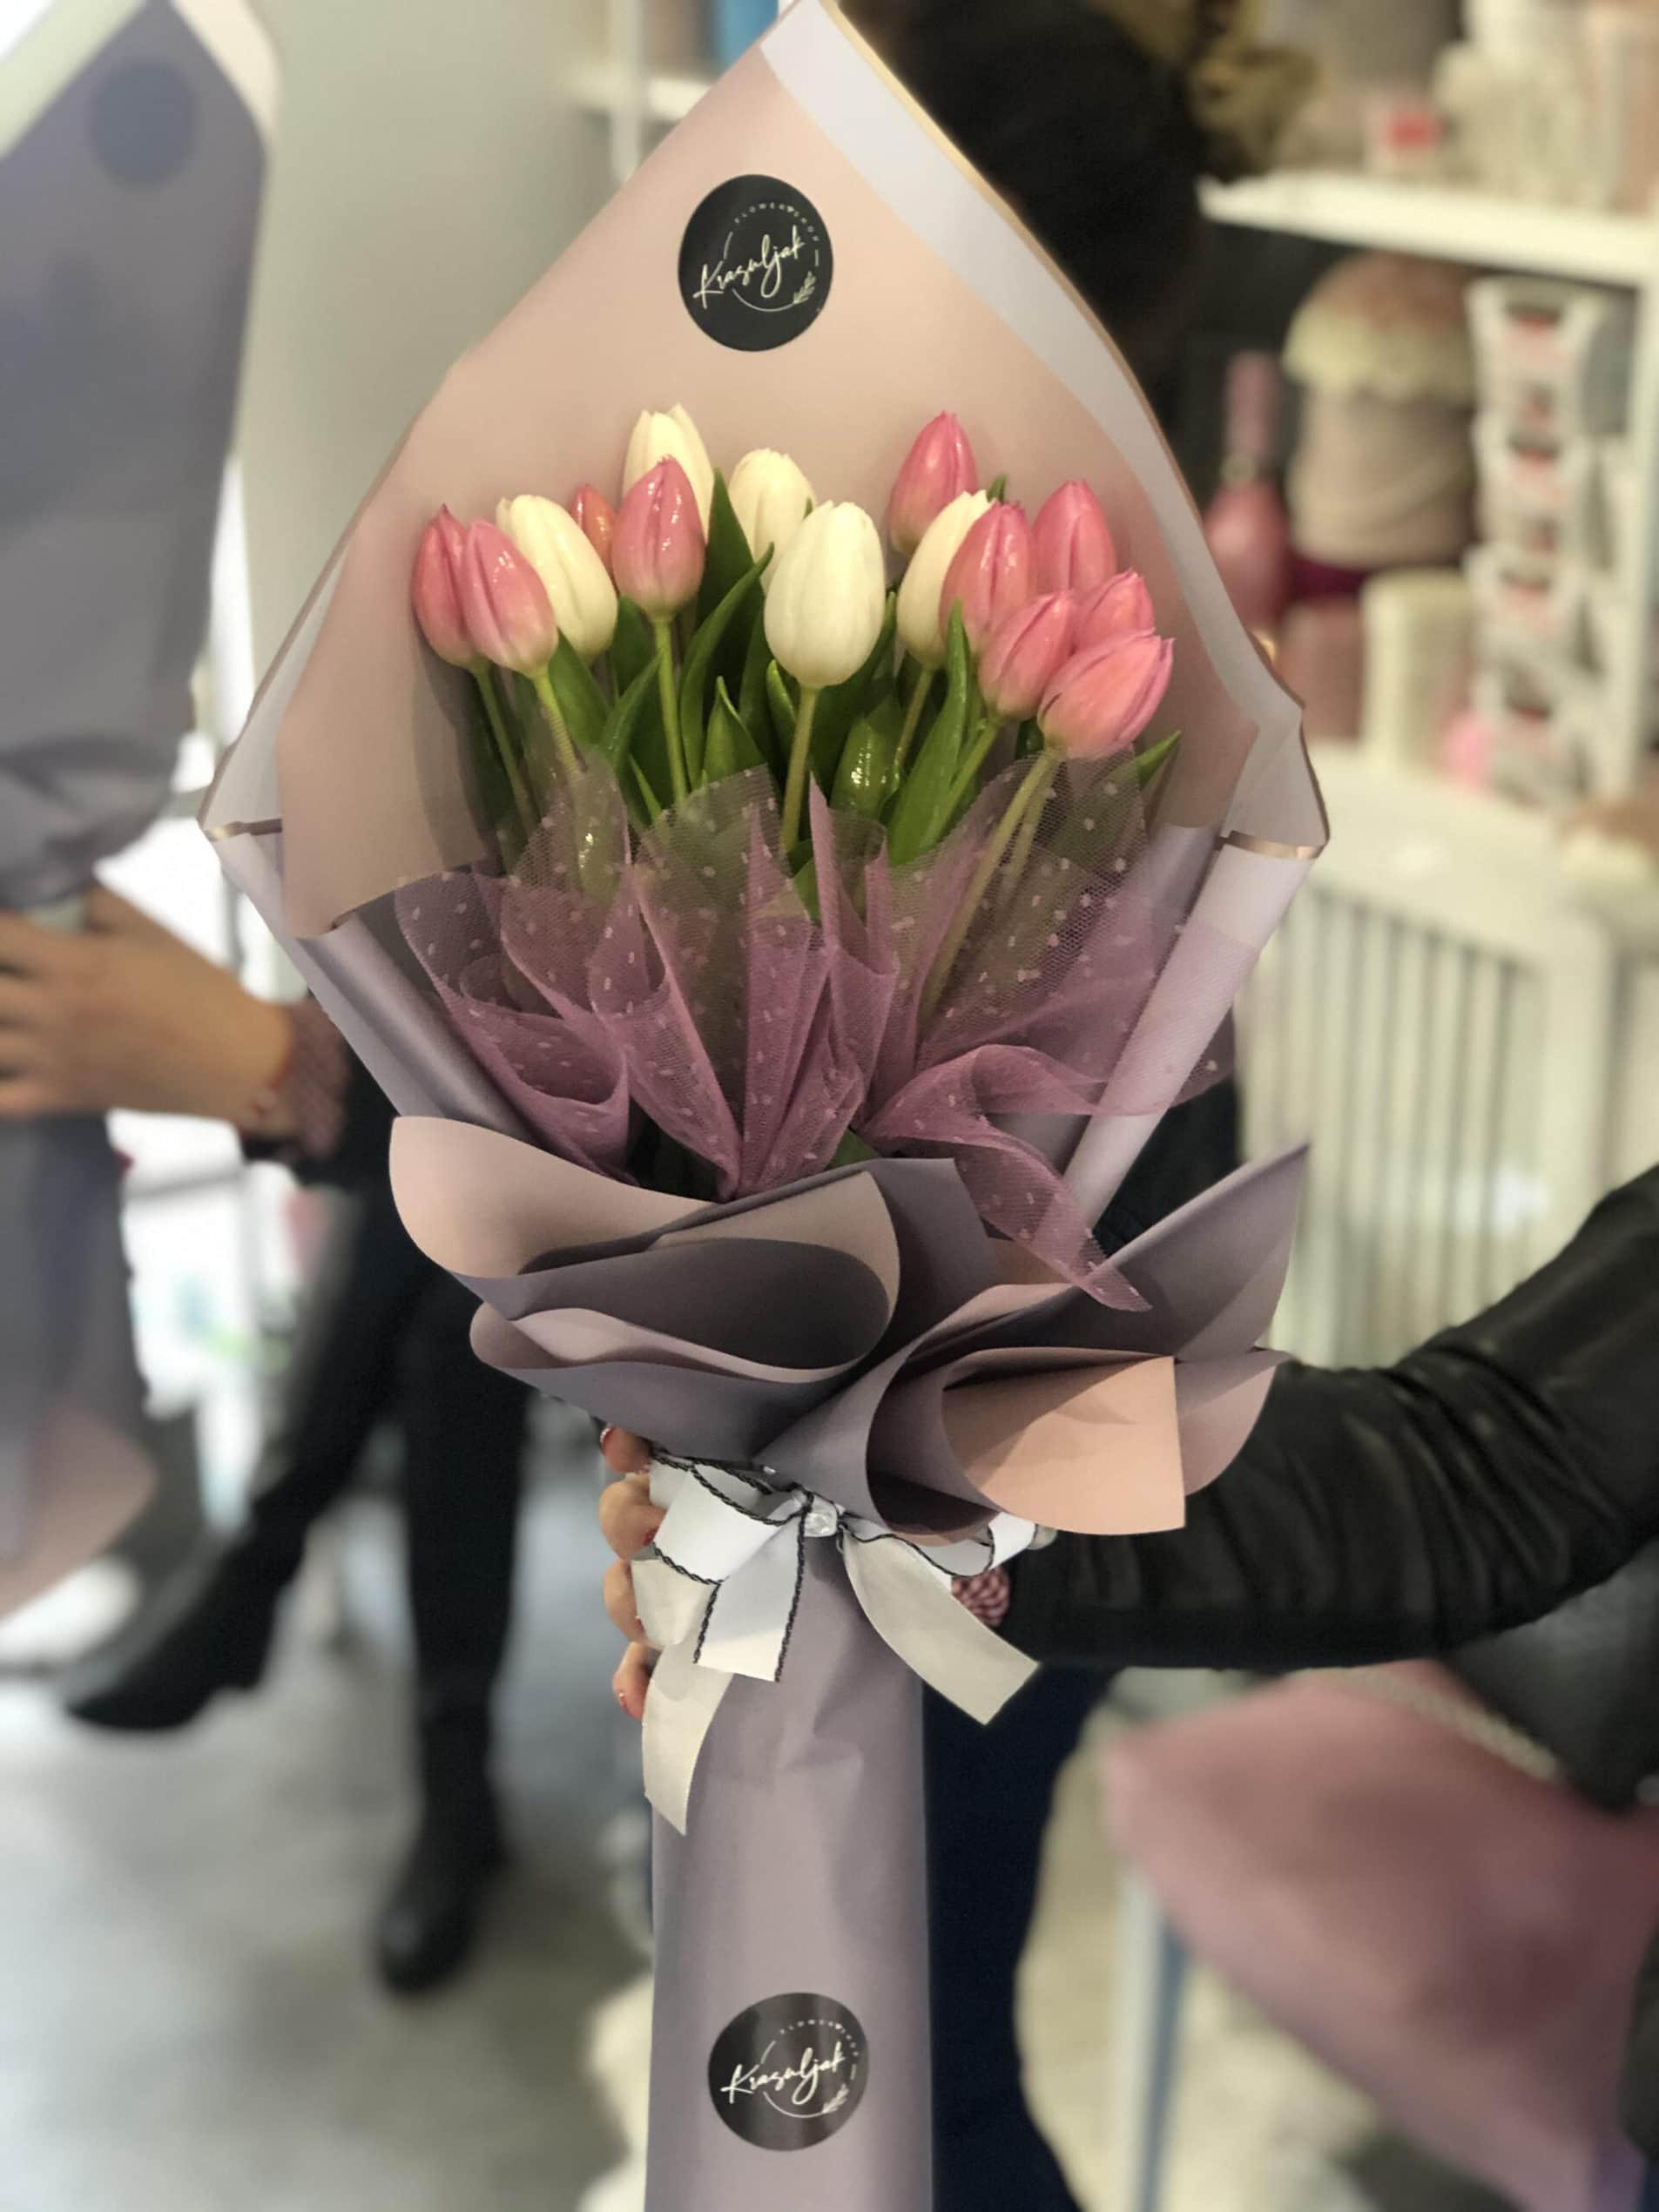 Cveće - lale u sivo rozem ukrasnom papiru